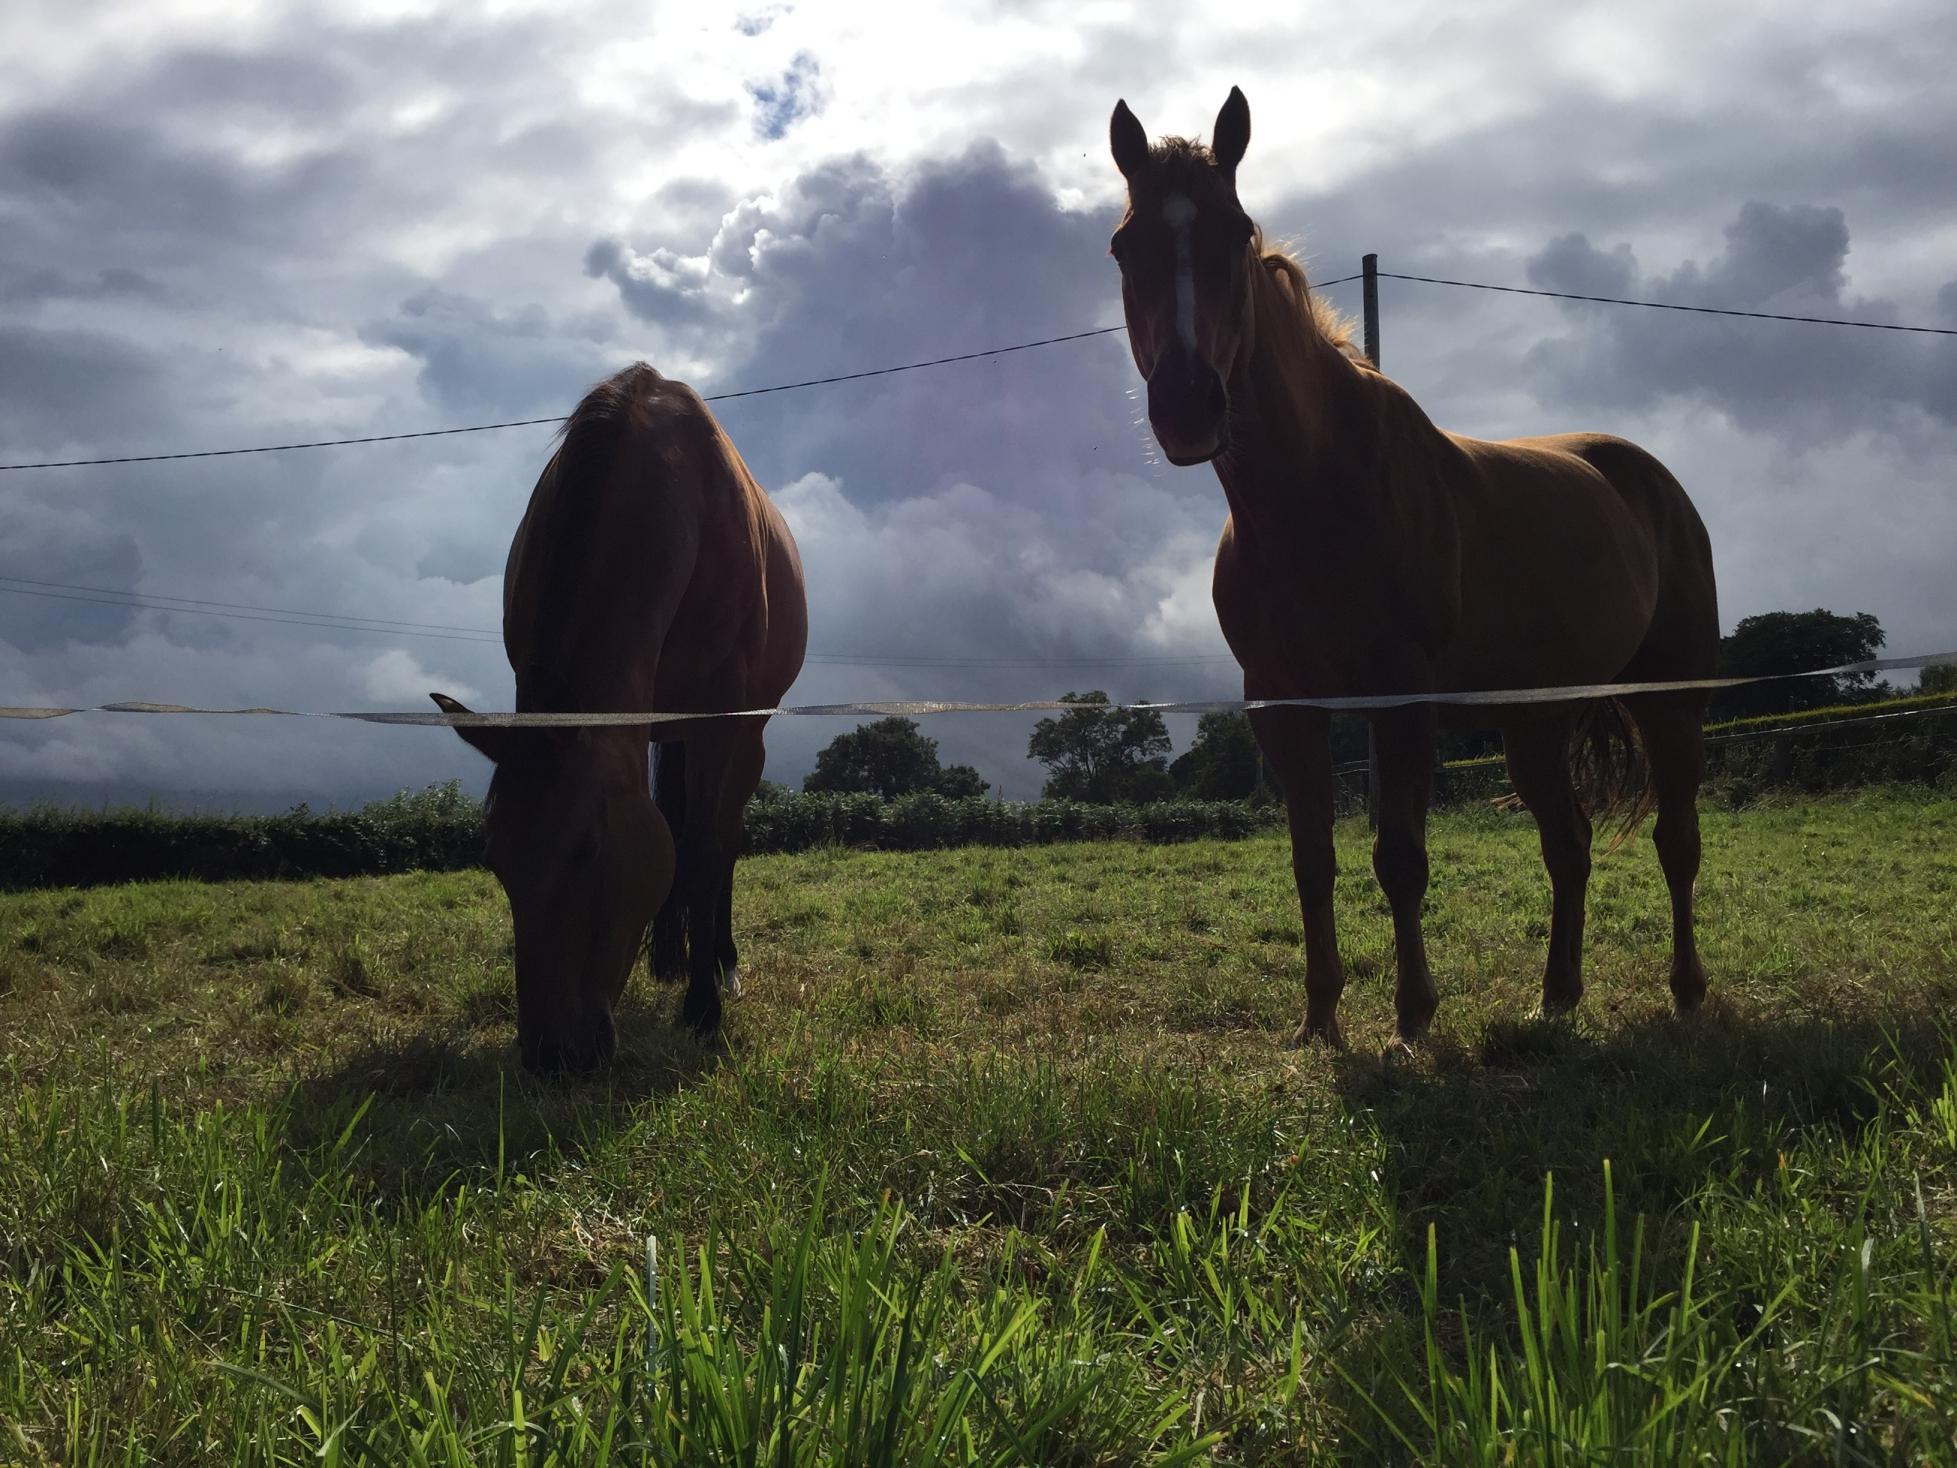 delamont_country_park_dexter_ni_explorer_niexplorer_newry_mourne_northern_ireland (28).jpg